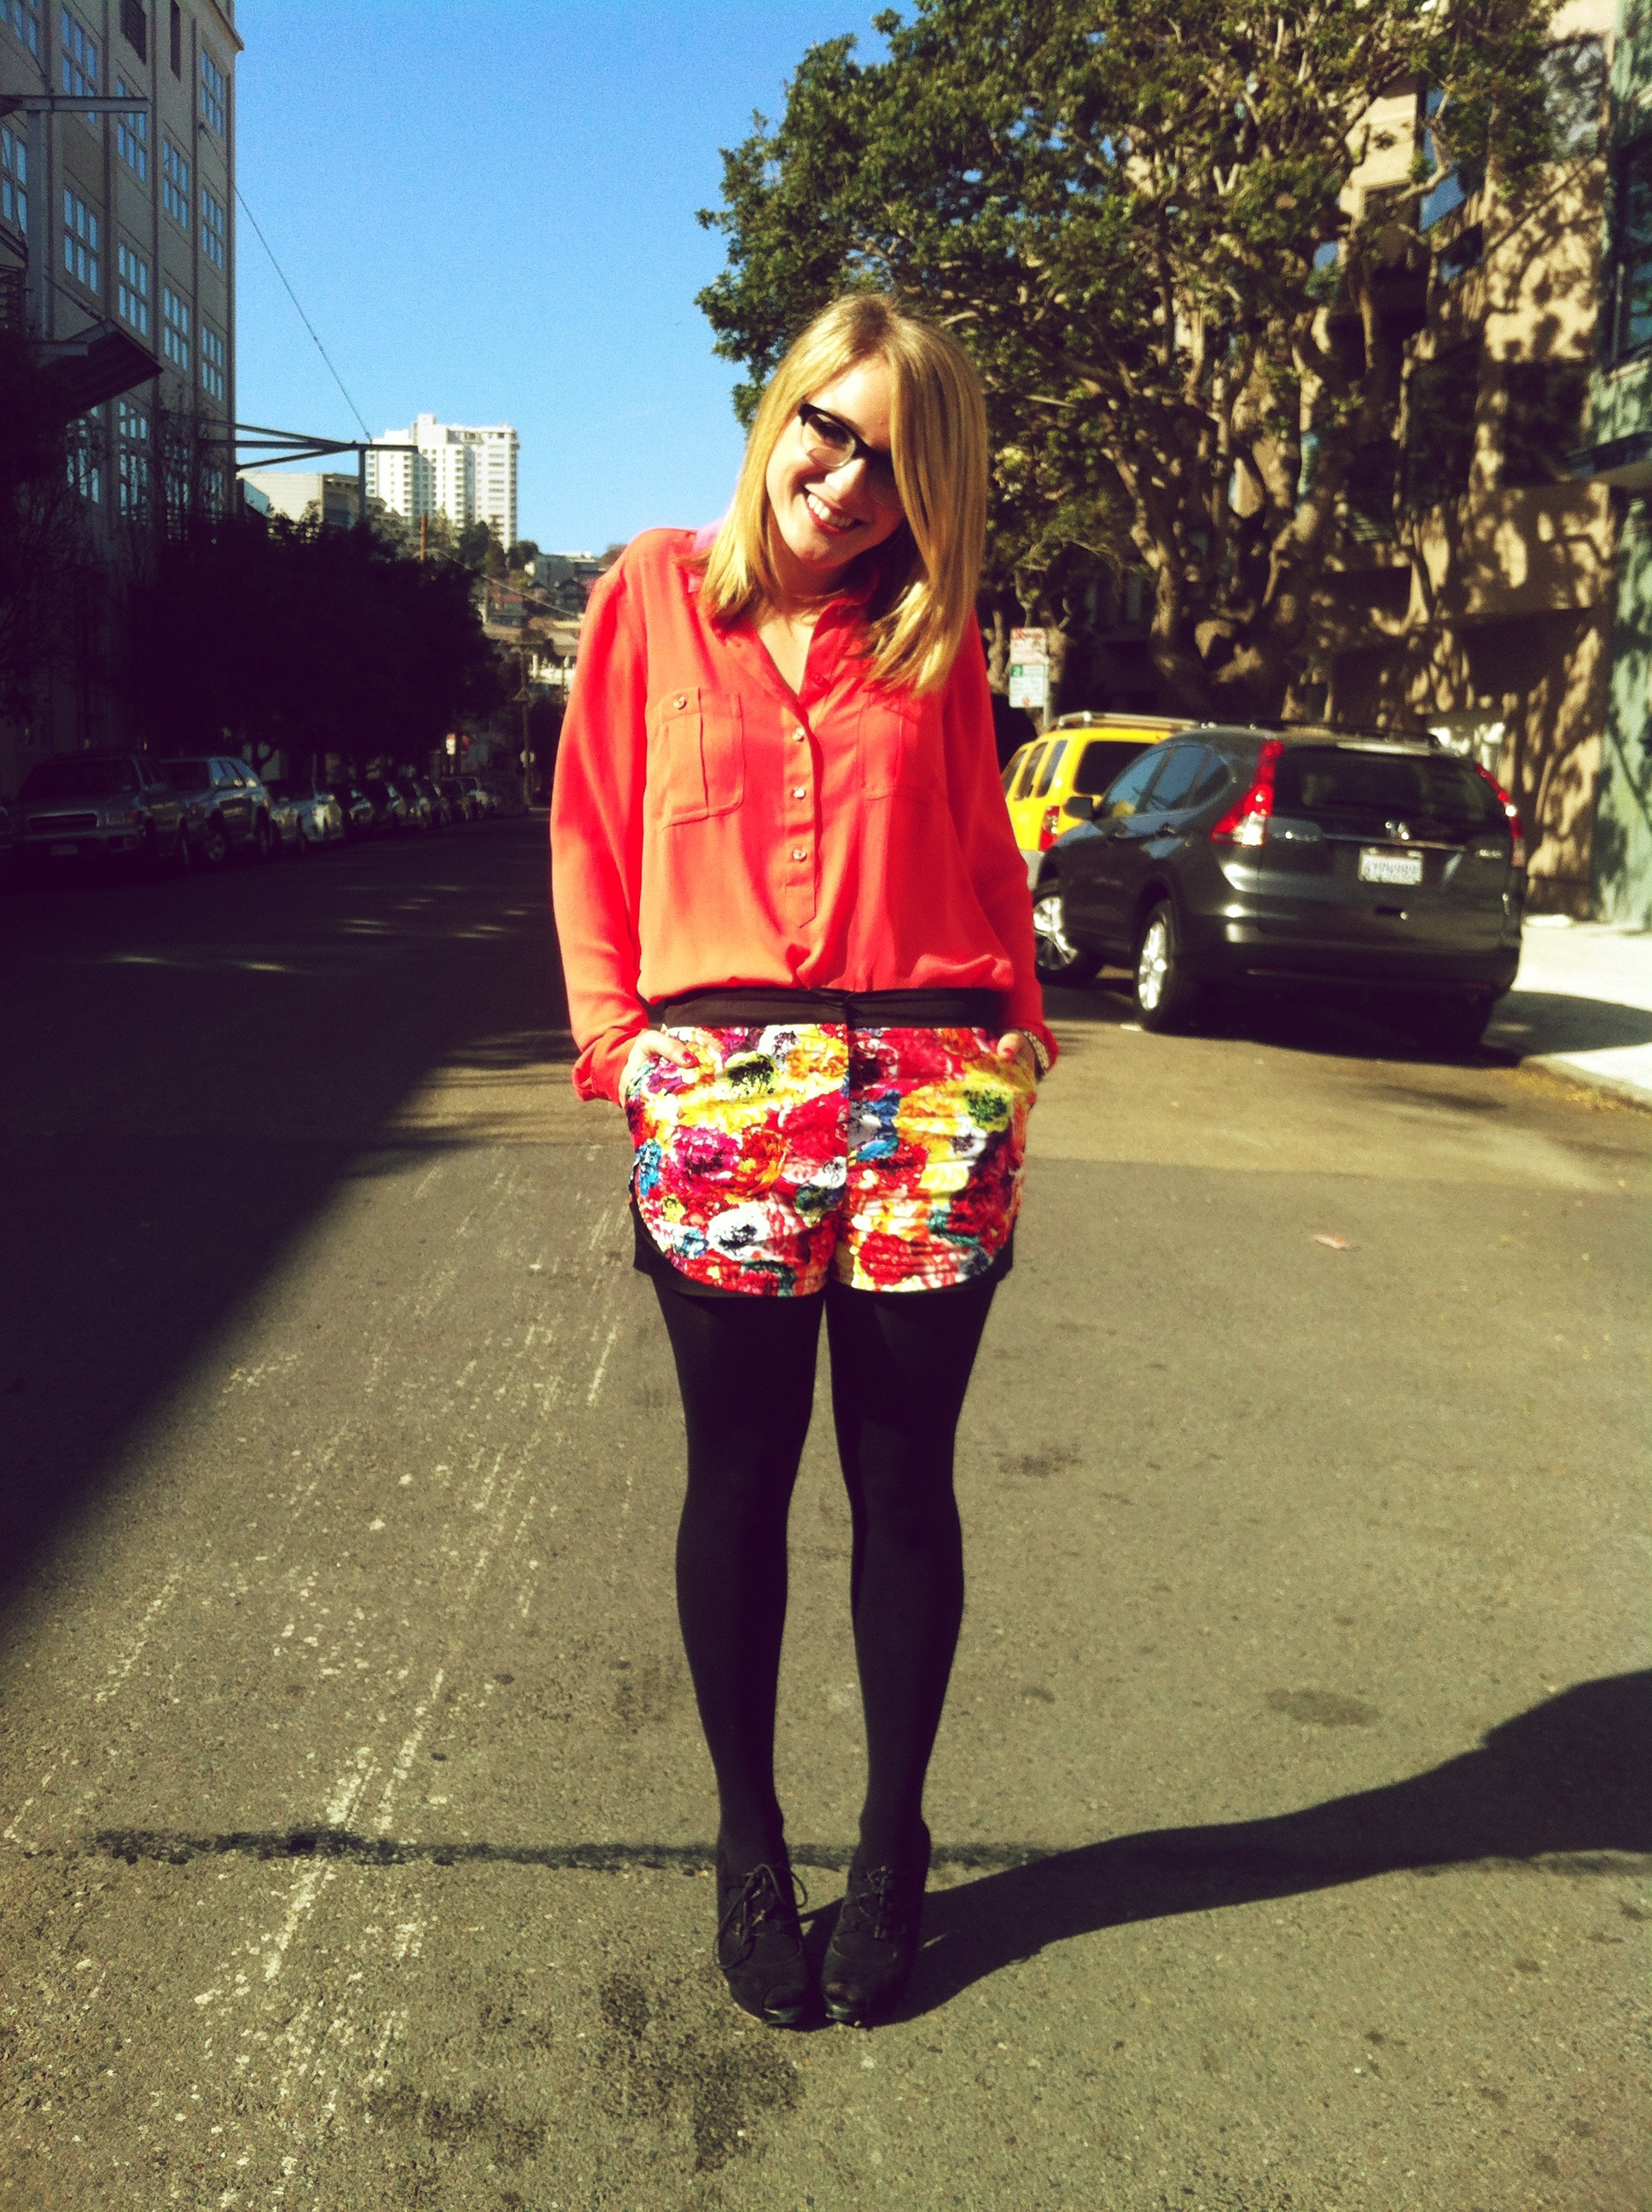 Shirt: LOFT | Shorts: Prabal Gurung x Target | Tights: H&M | Shoes: Talbot's | Ring: F21